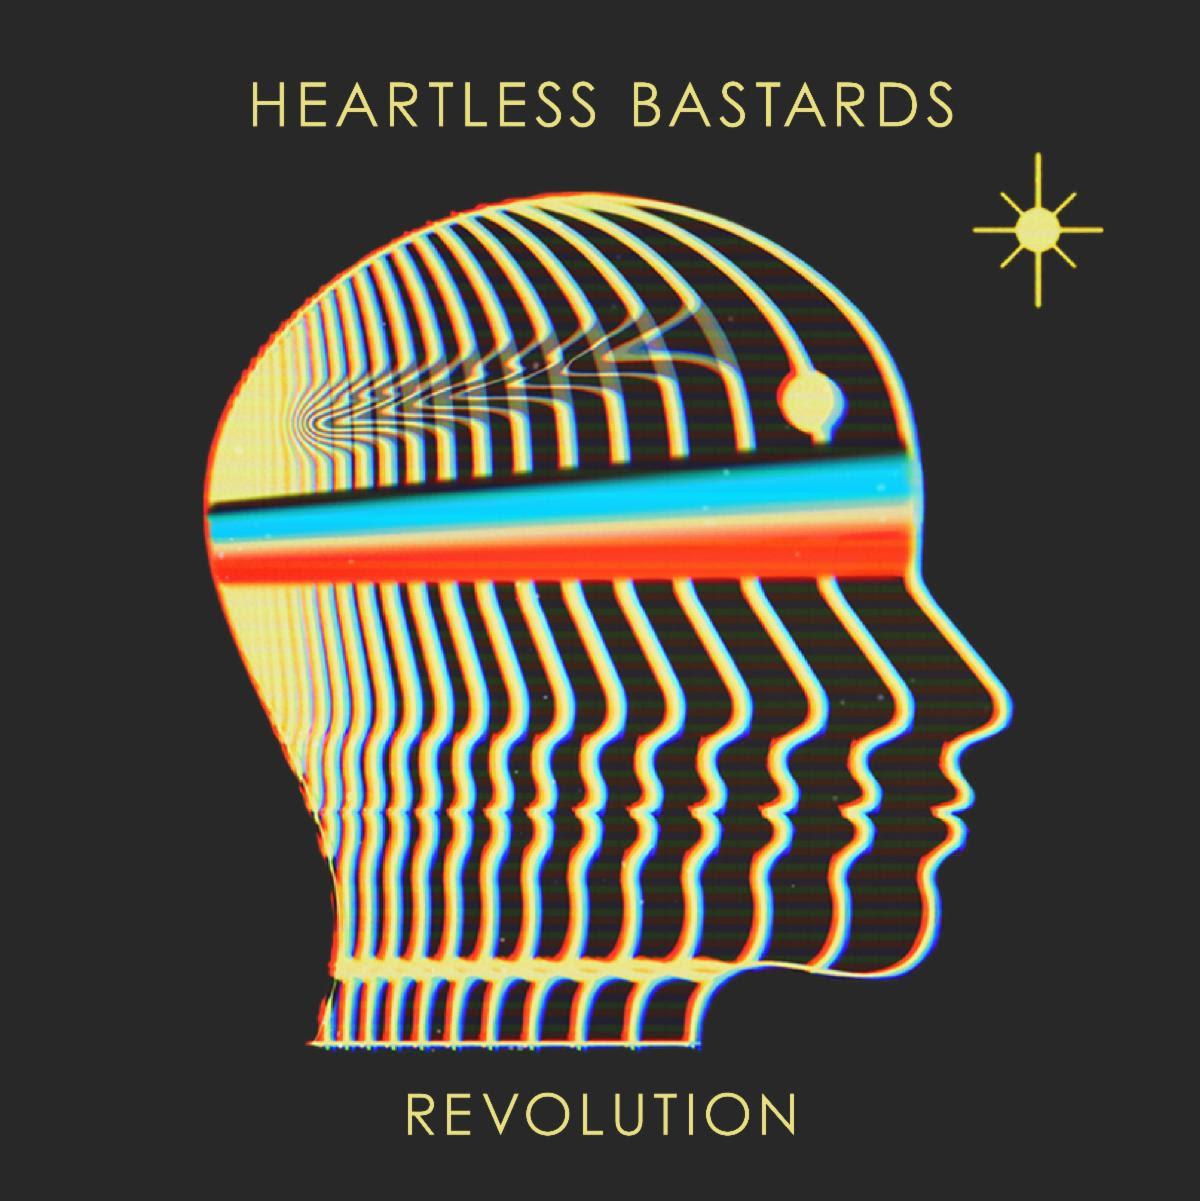 heartless bastards revolution song artwork Heartless Bastards Start a Revolution on First Single in Five Years: Stream